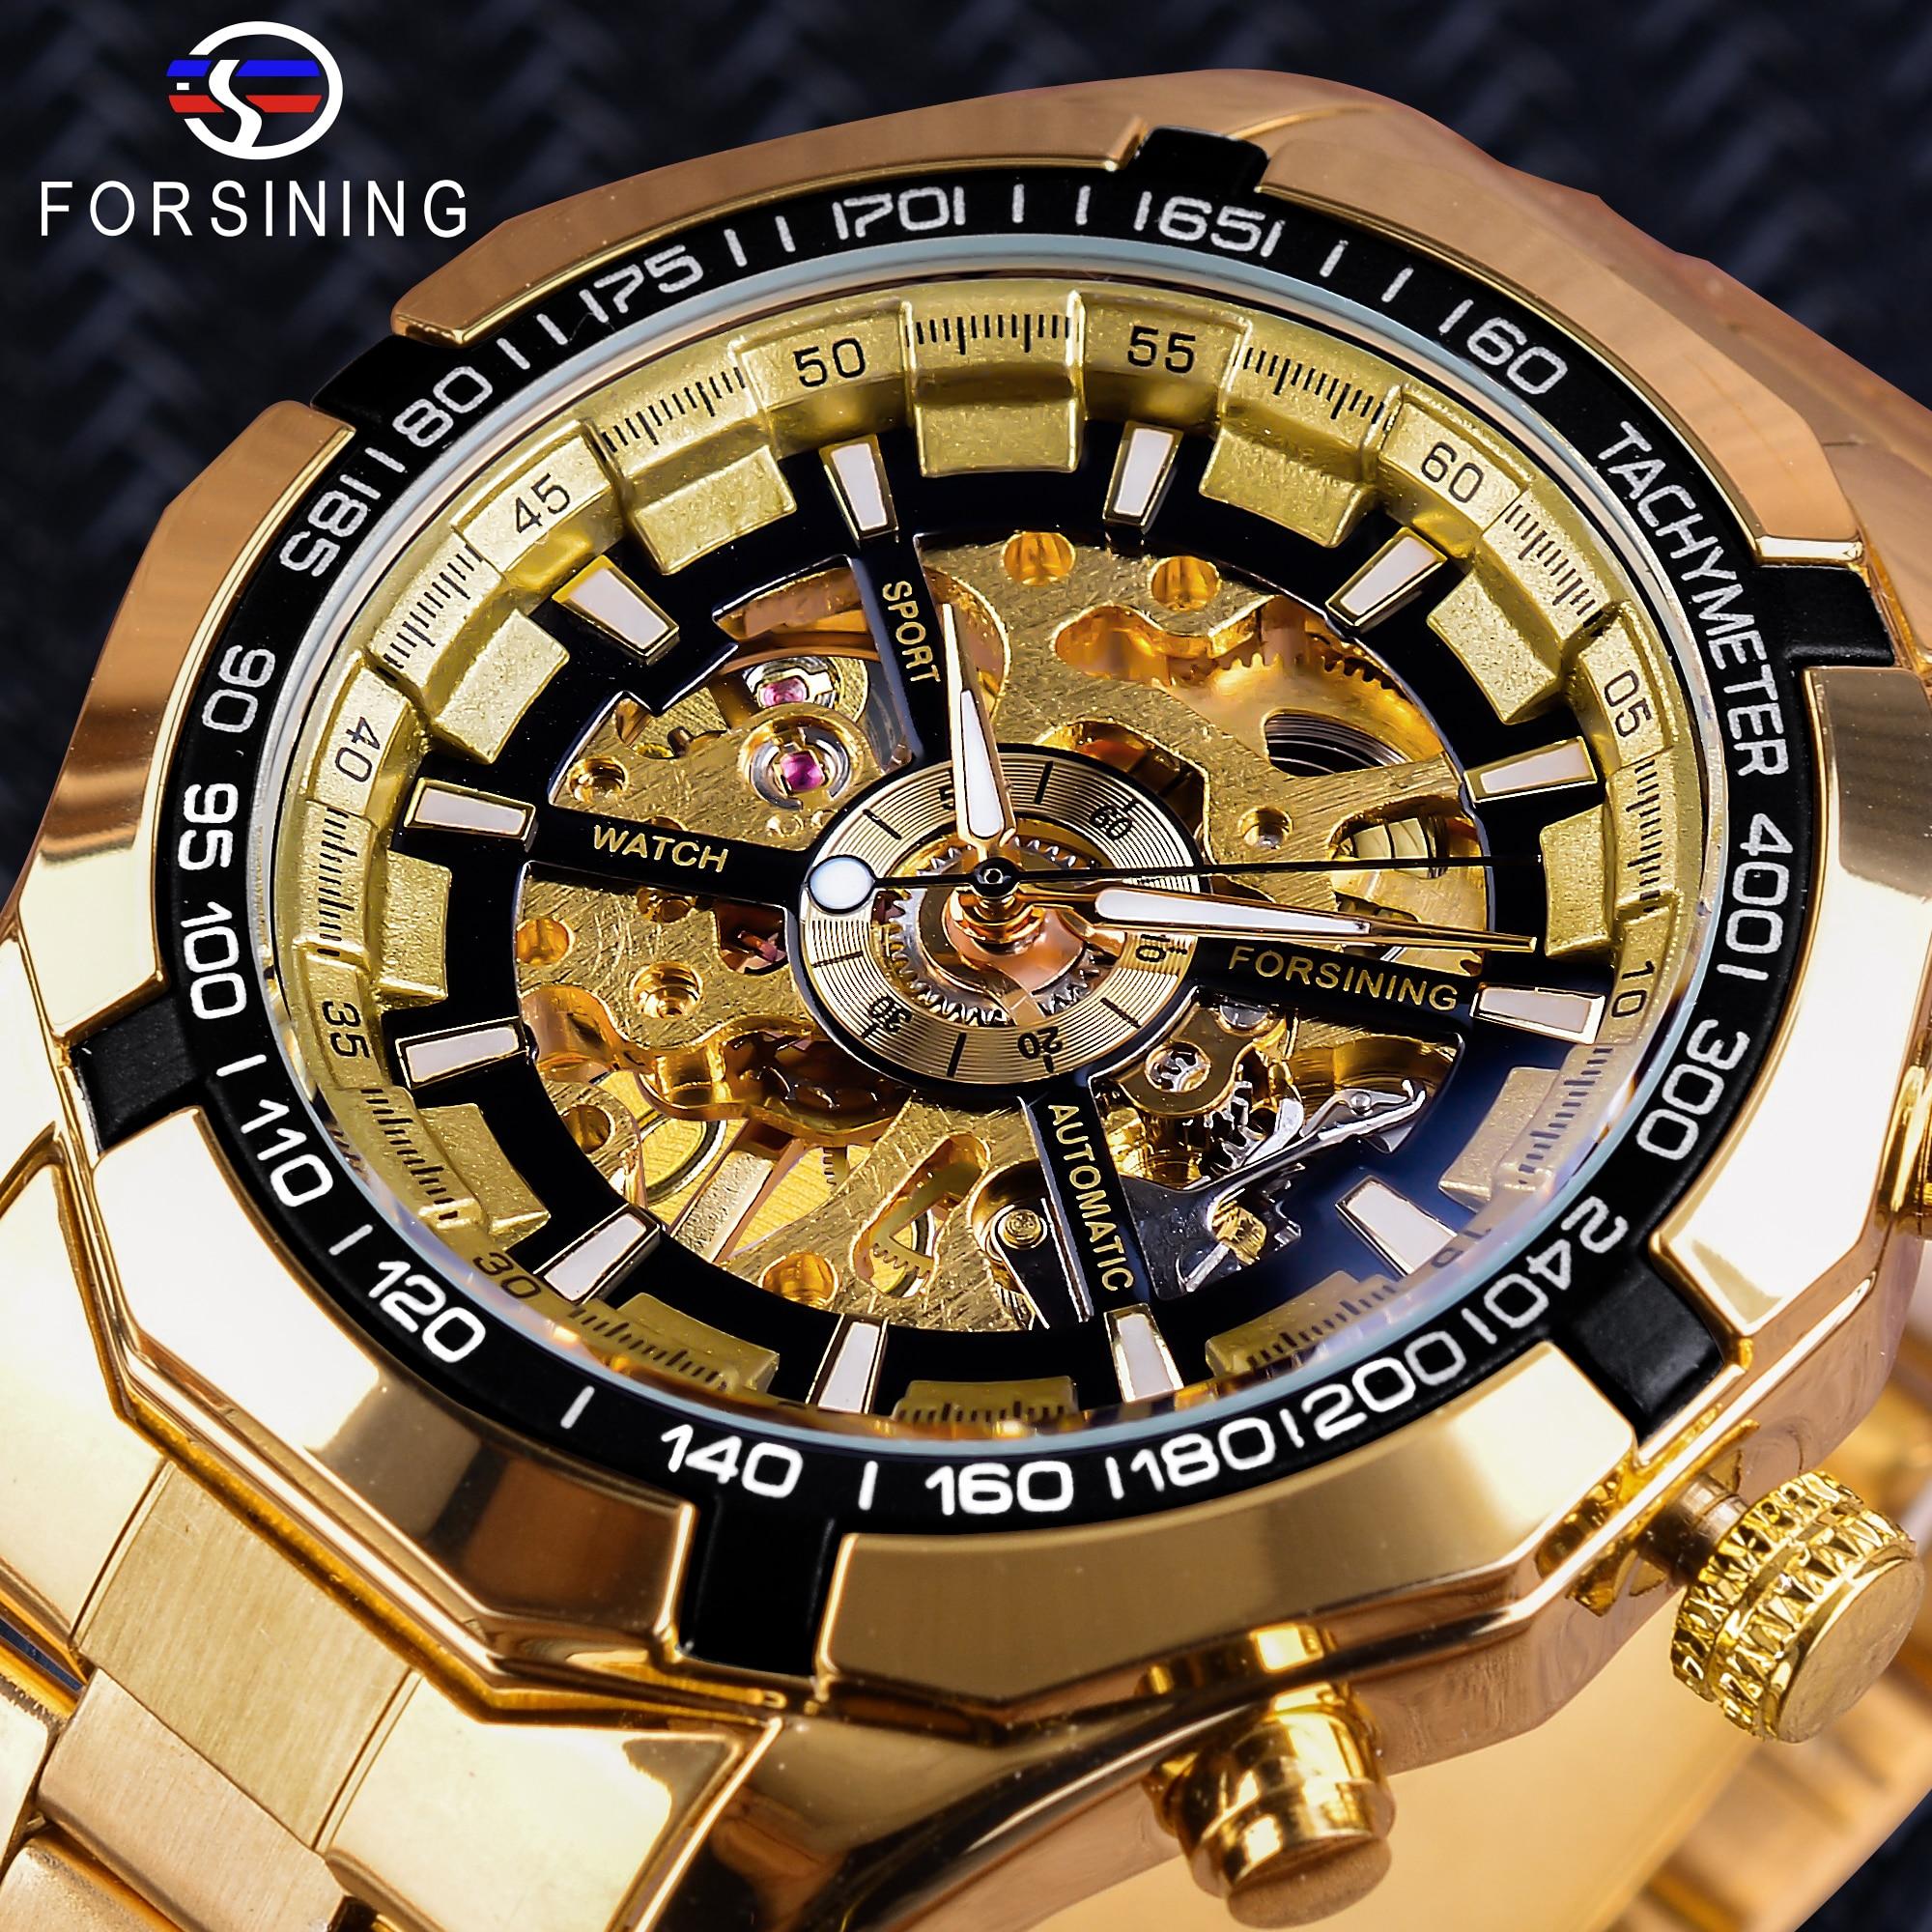 Forsining 2018 Sport Wristwatch Bracelet for Men Golden Clock Top Brand Luxury Creative Skeleton Men's Mechanical Watches uhren